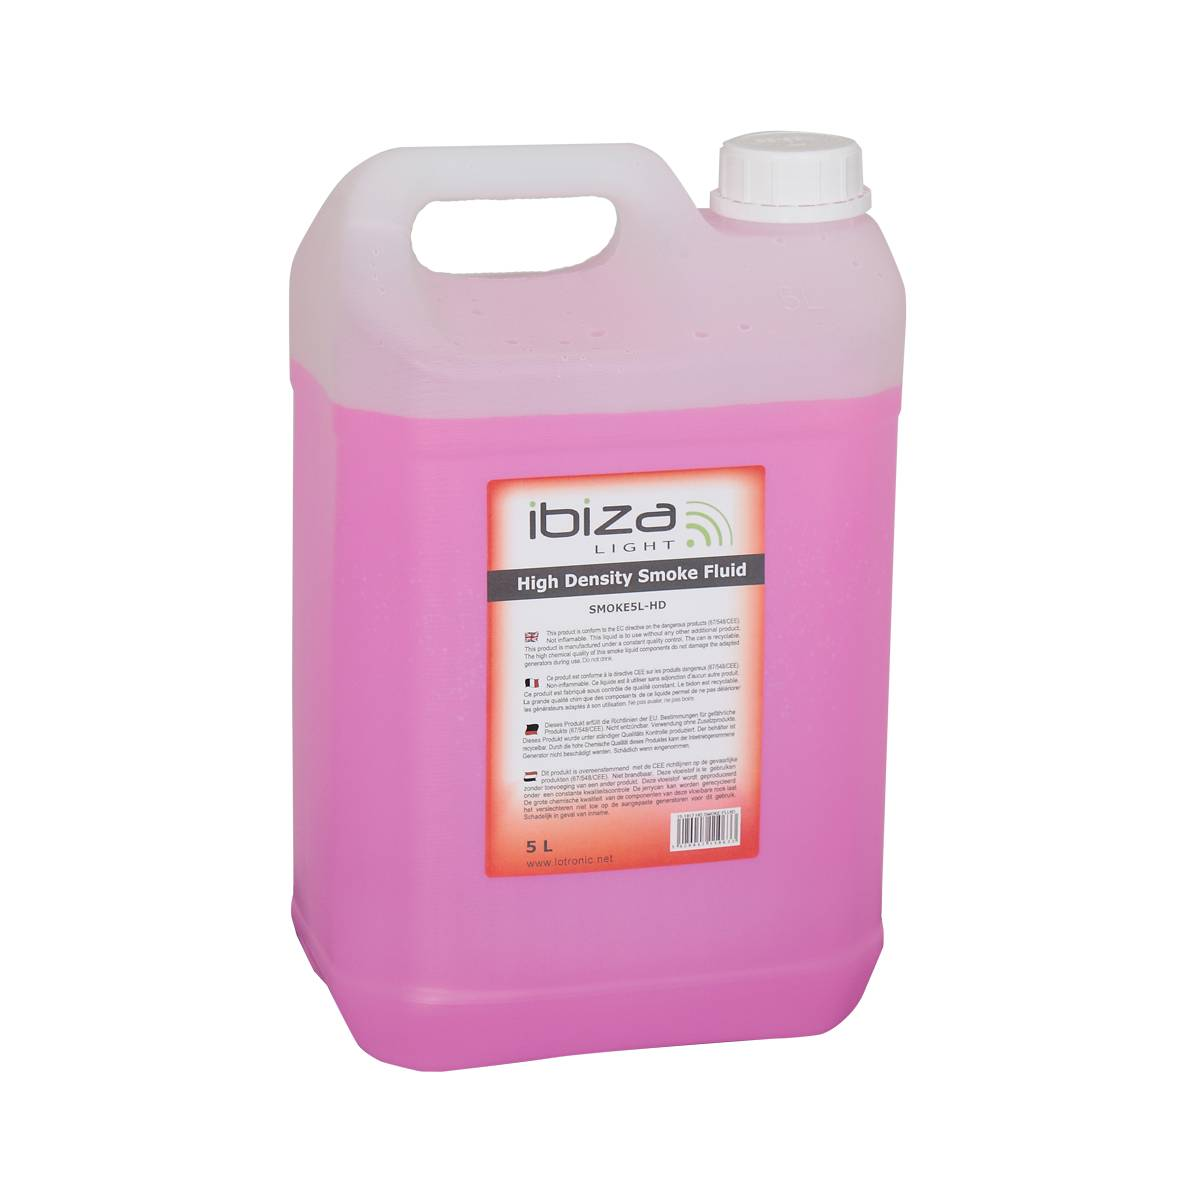 Ibiza Light Liquide fumée standard 5 litres - SMOKE5L-HD